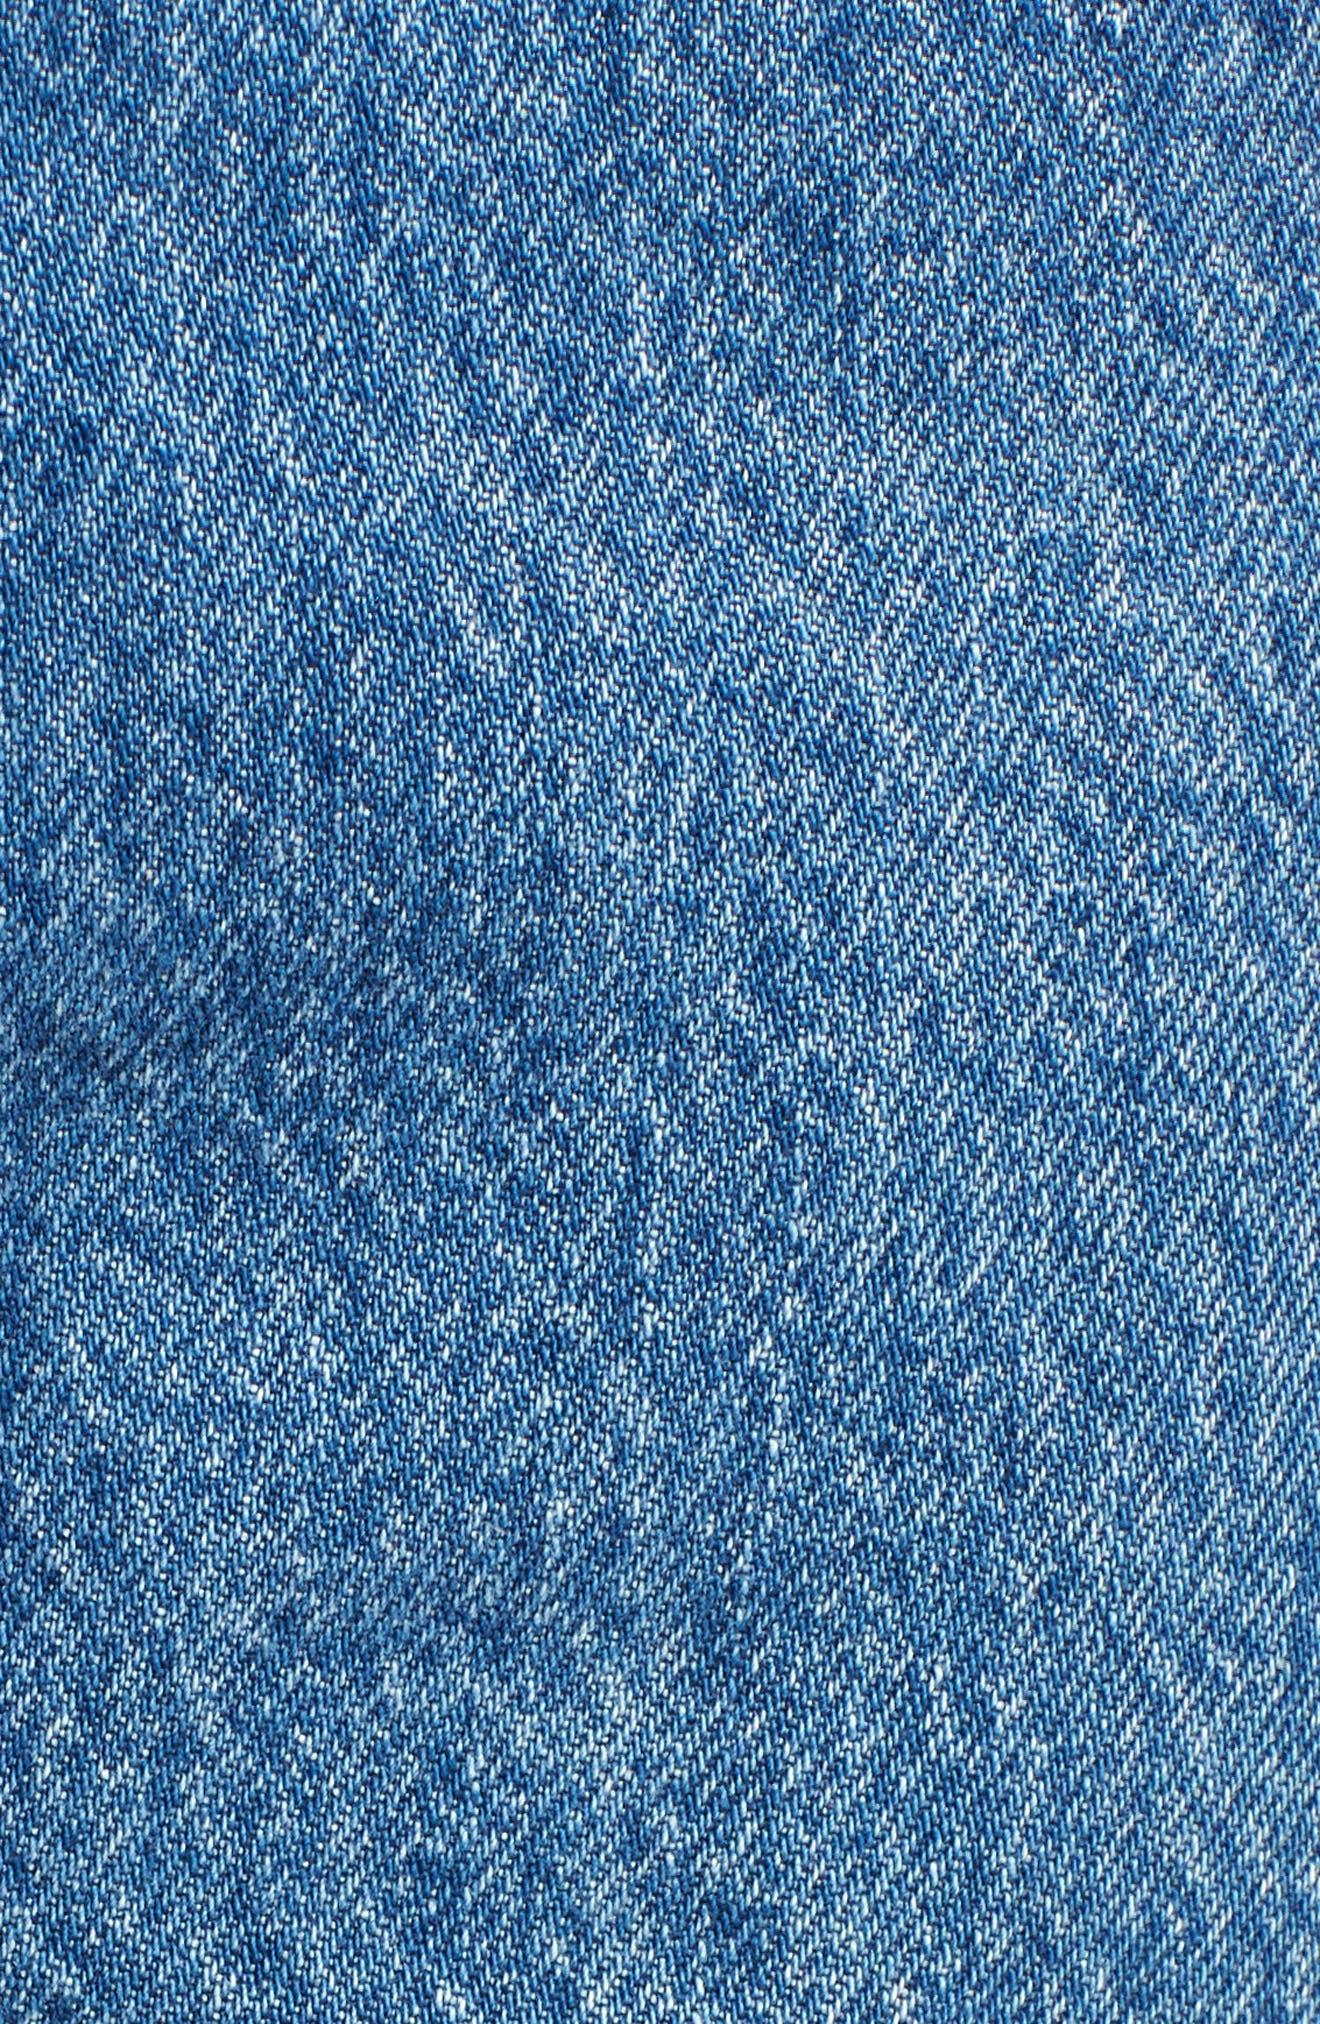 501 High Waist Crop Jeans,                             Alternate thumbnail 5, color,                             Spectator Sport